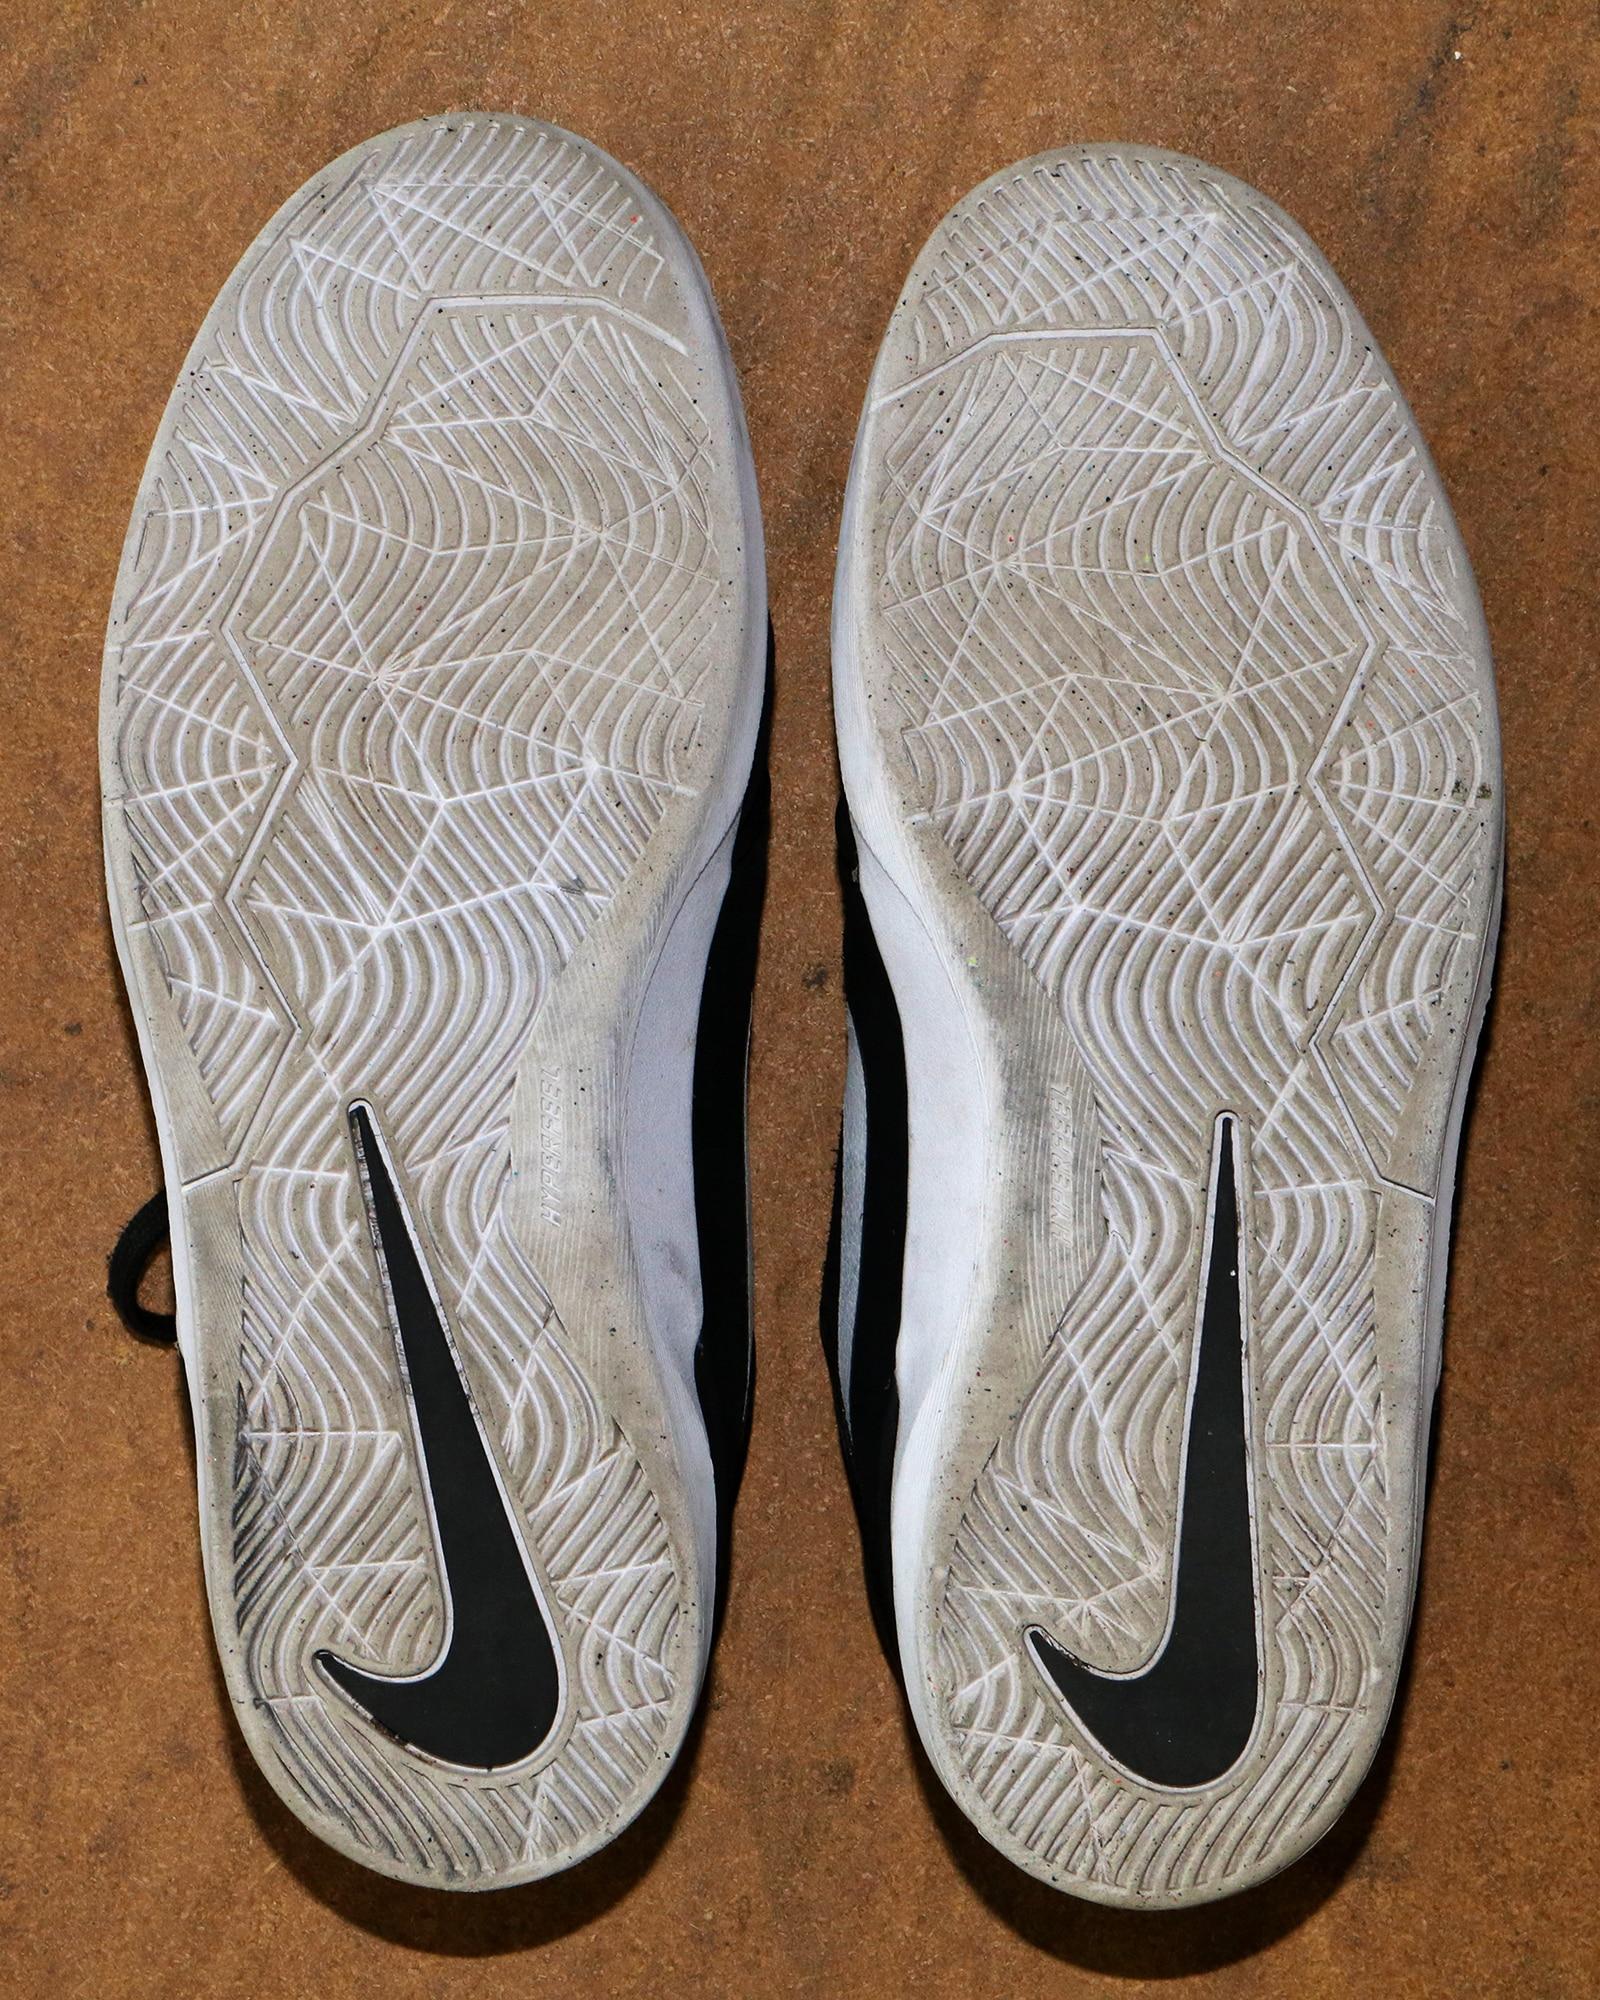 sale retailer 11da5 c7e8a shop Nike SB Janoski Hyperfeel Skate Shoes